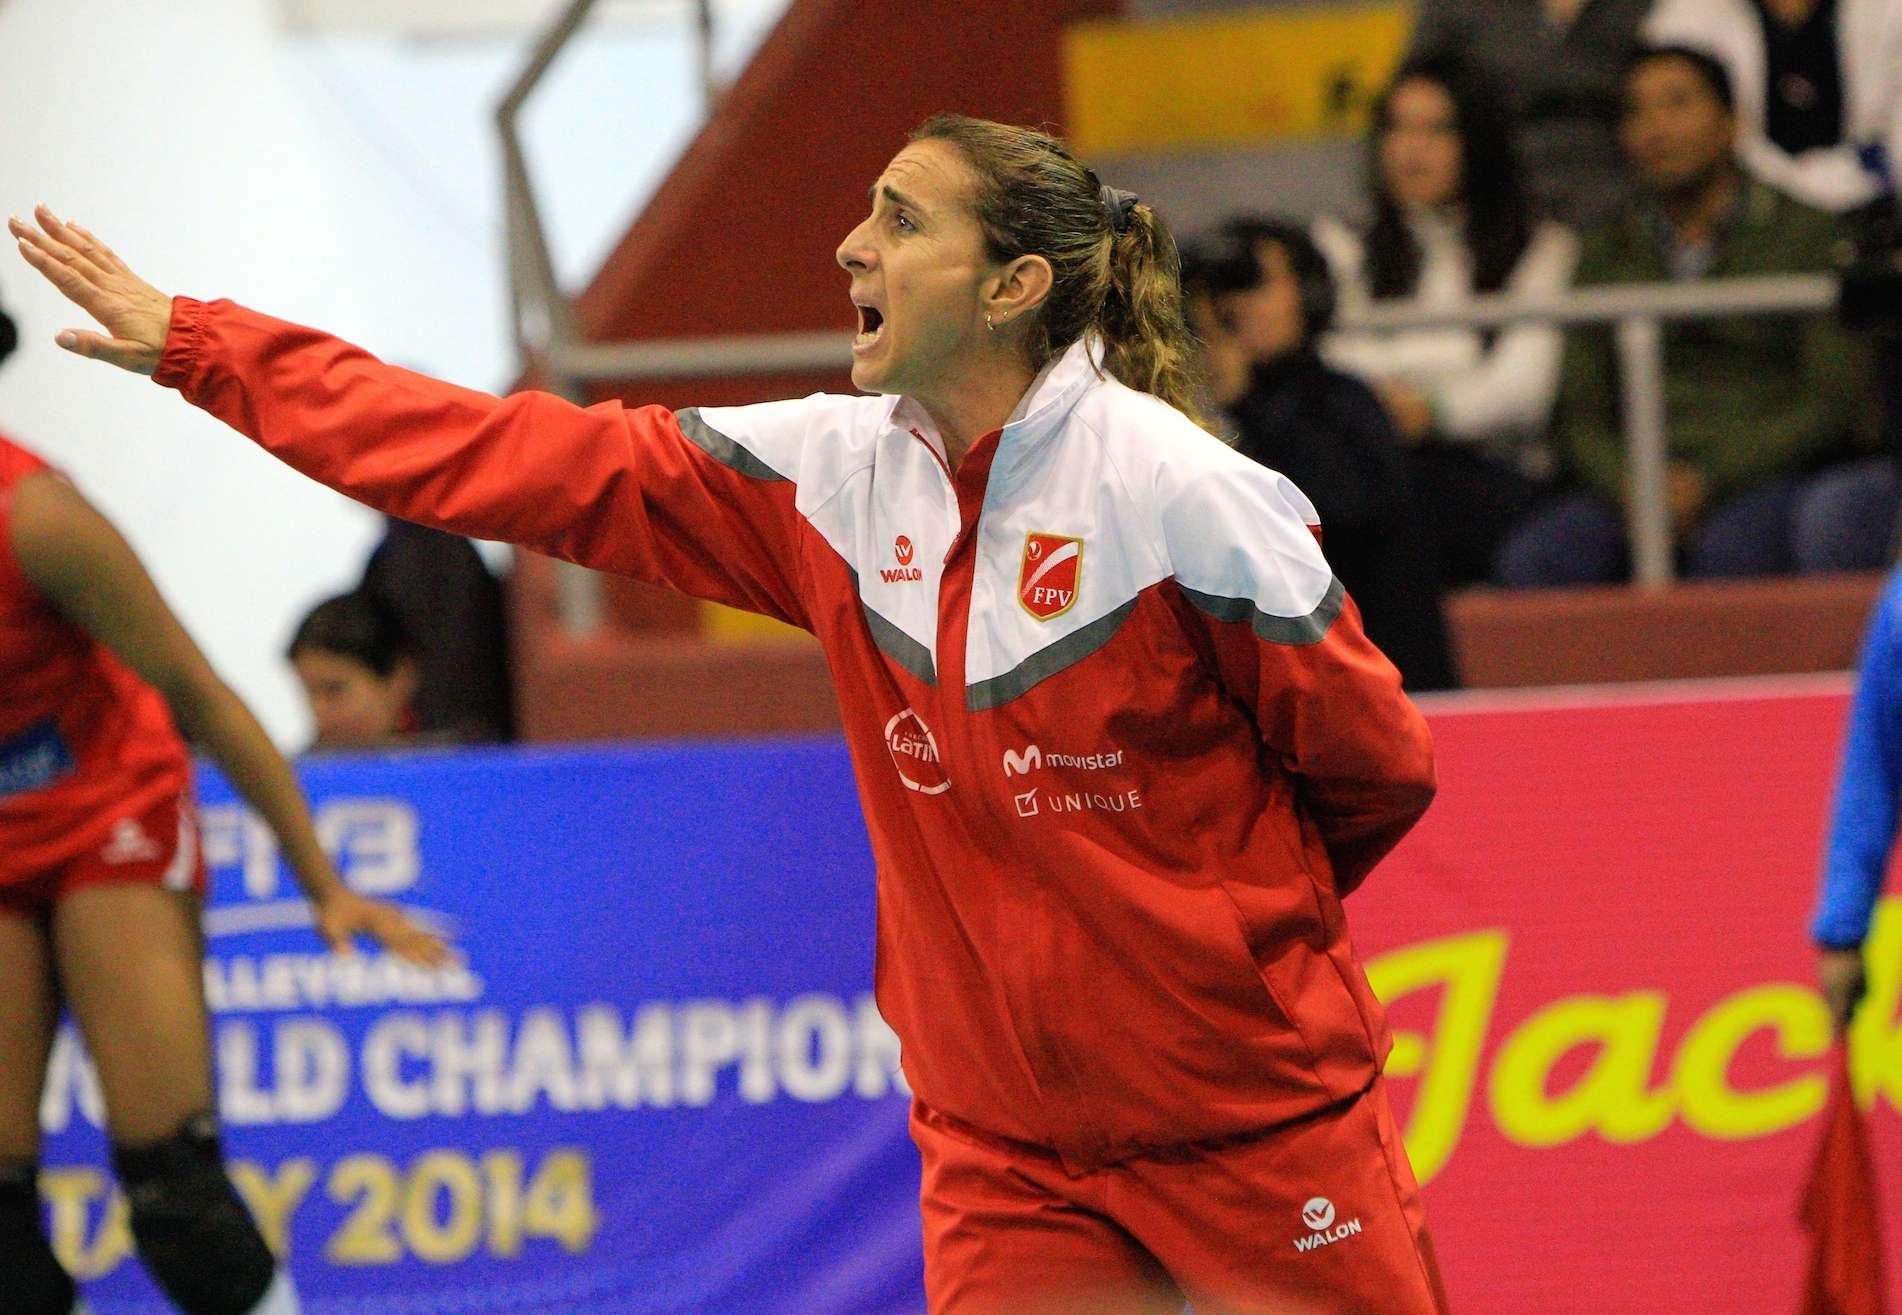 Natalia Málaga, entrenadora del seleccionado peruano. Foto: FPV